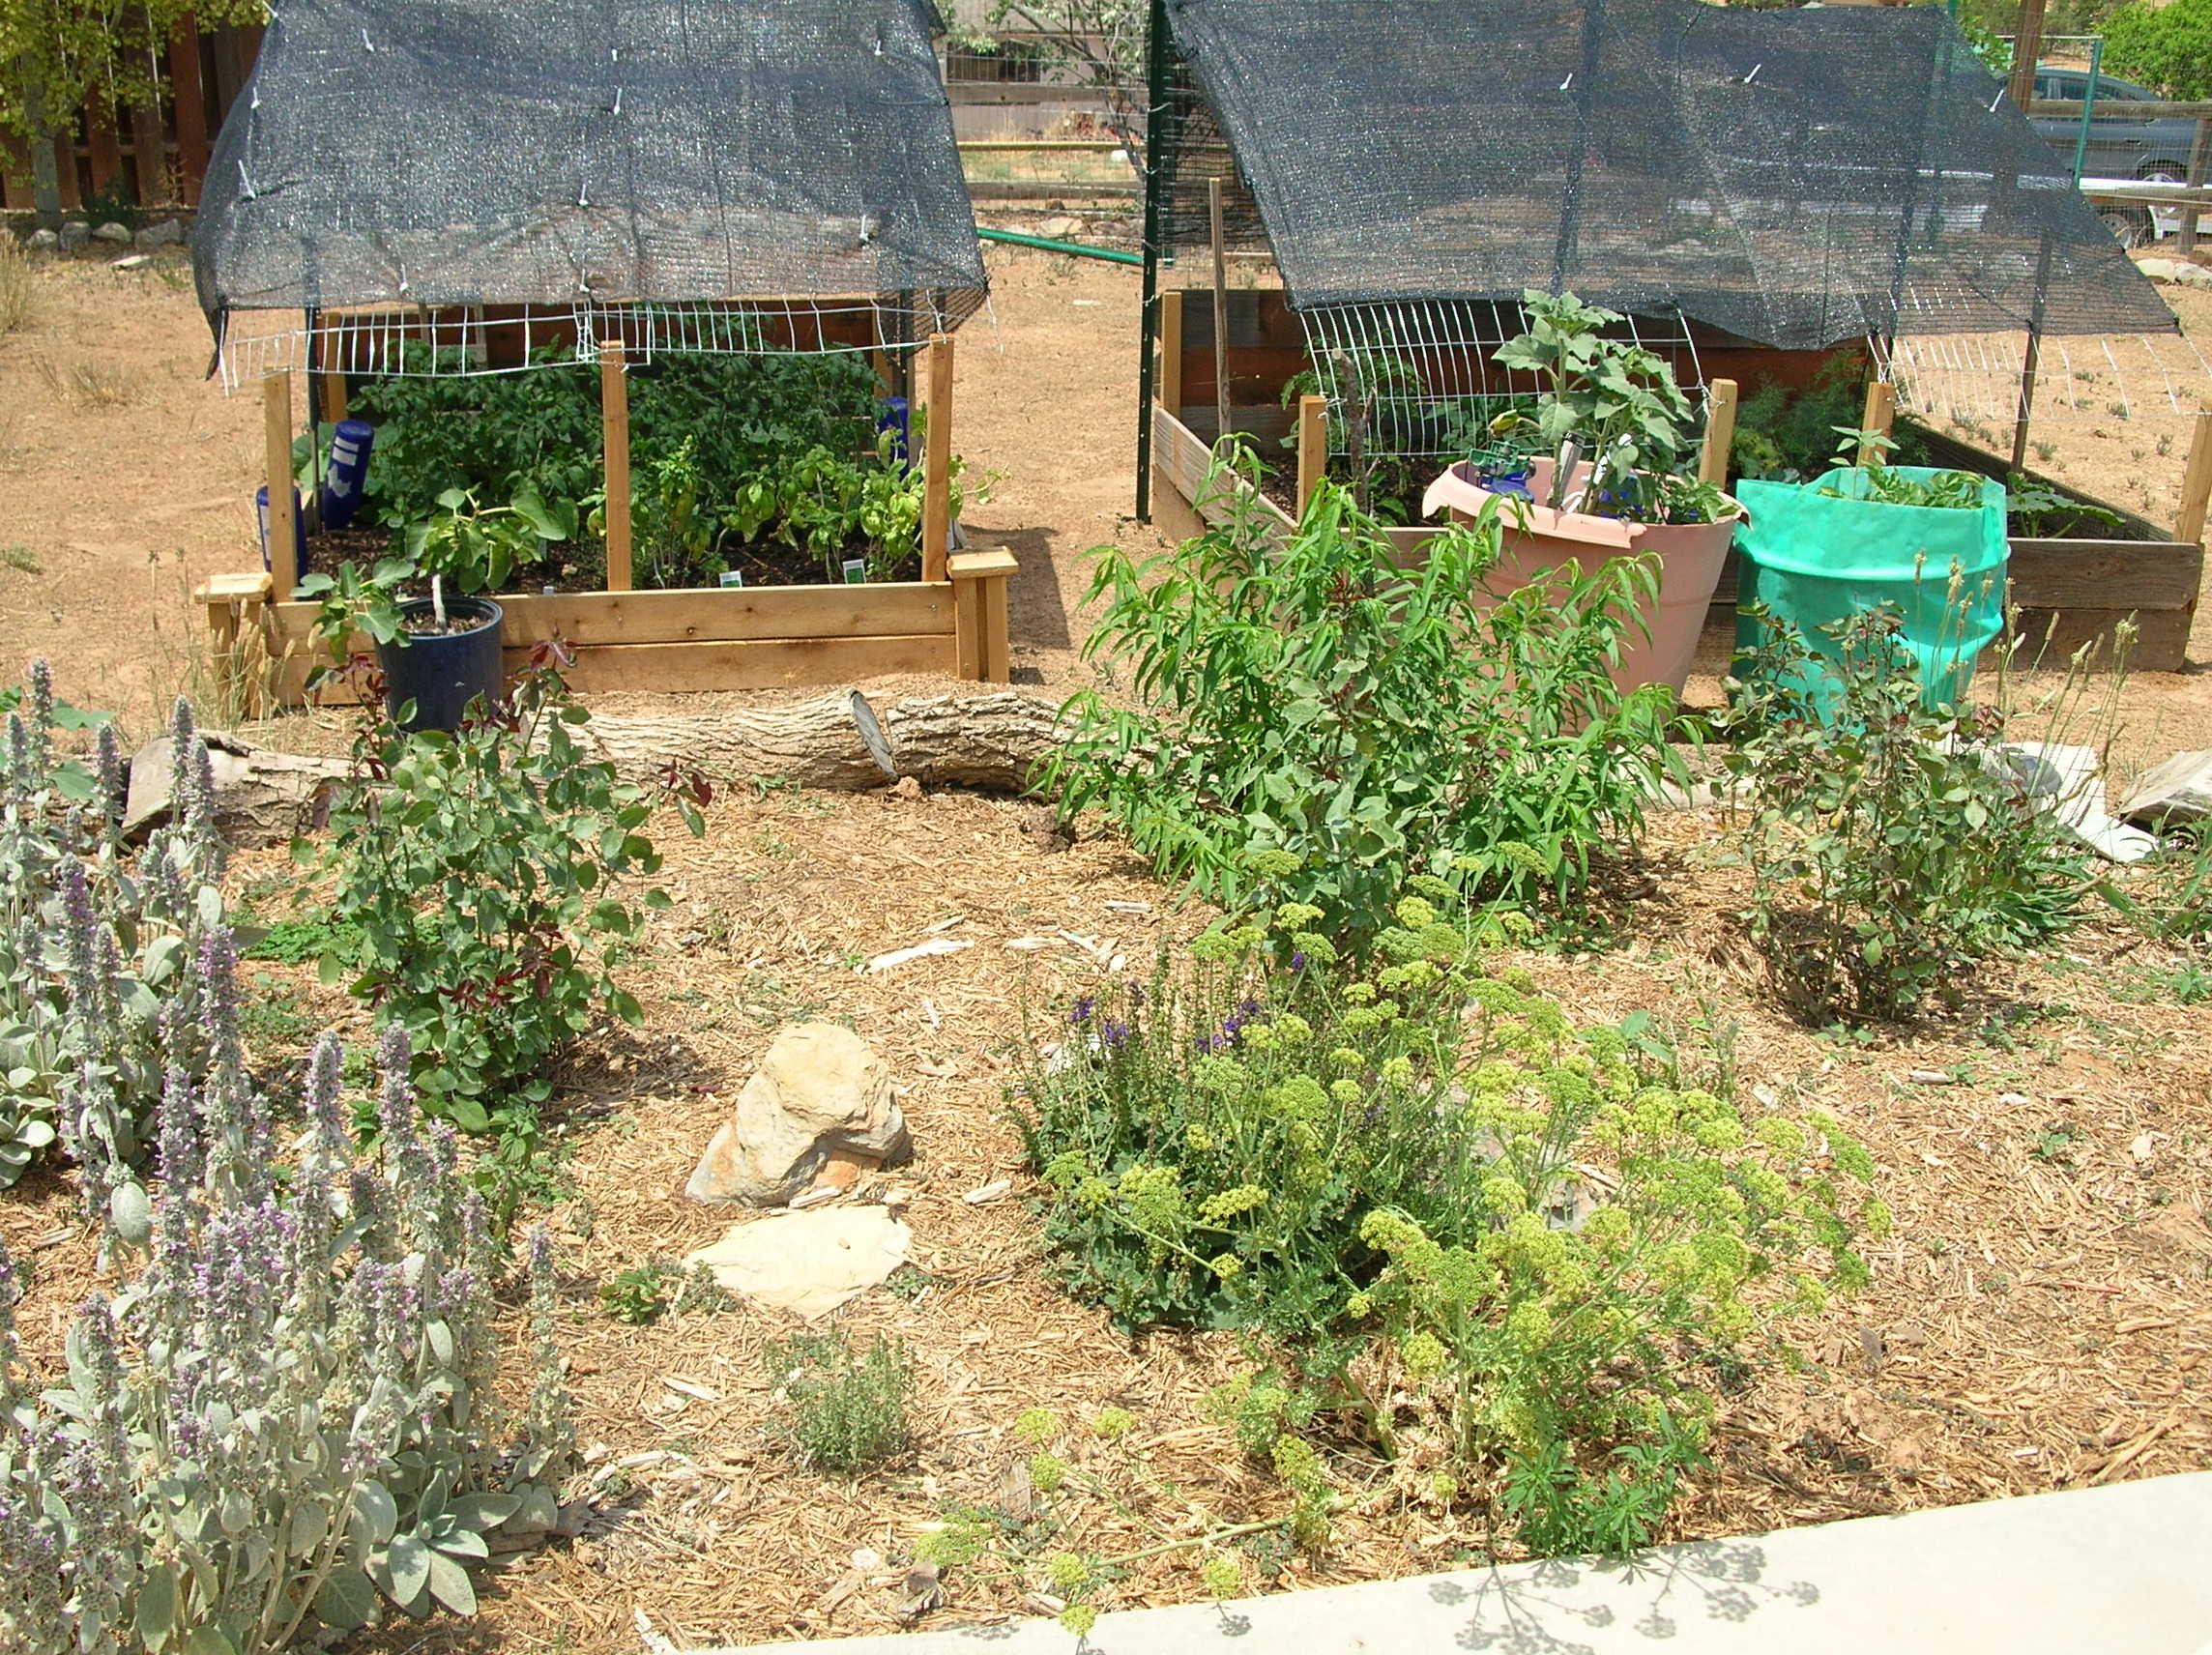 backyard garden 2011 gfcelebration